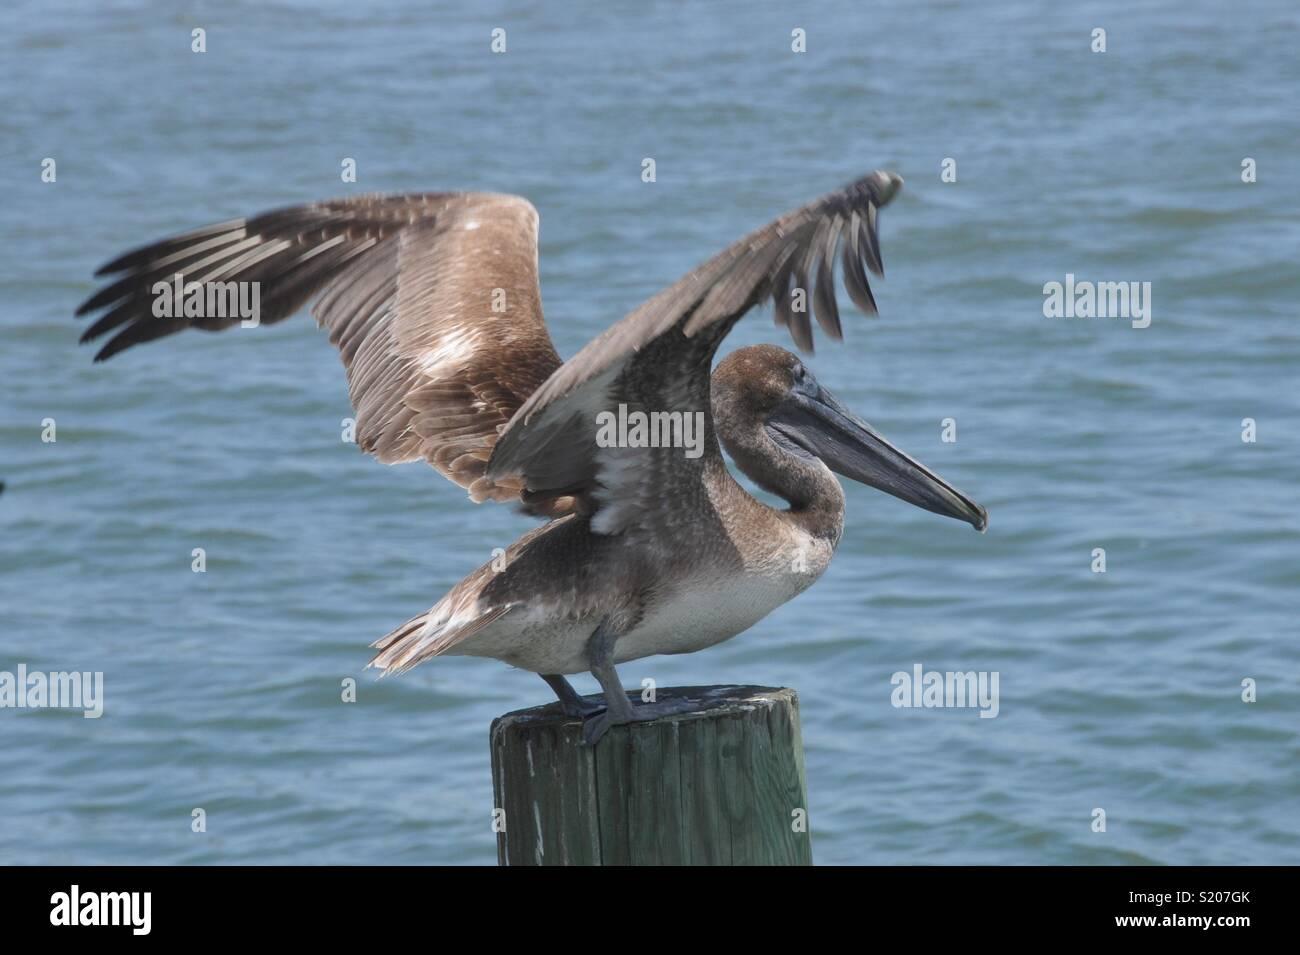 Brown Pelican in Mustang Island, TX. - Stock Image